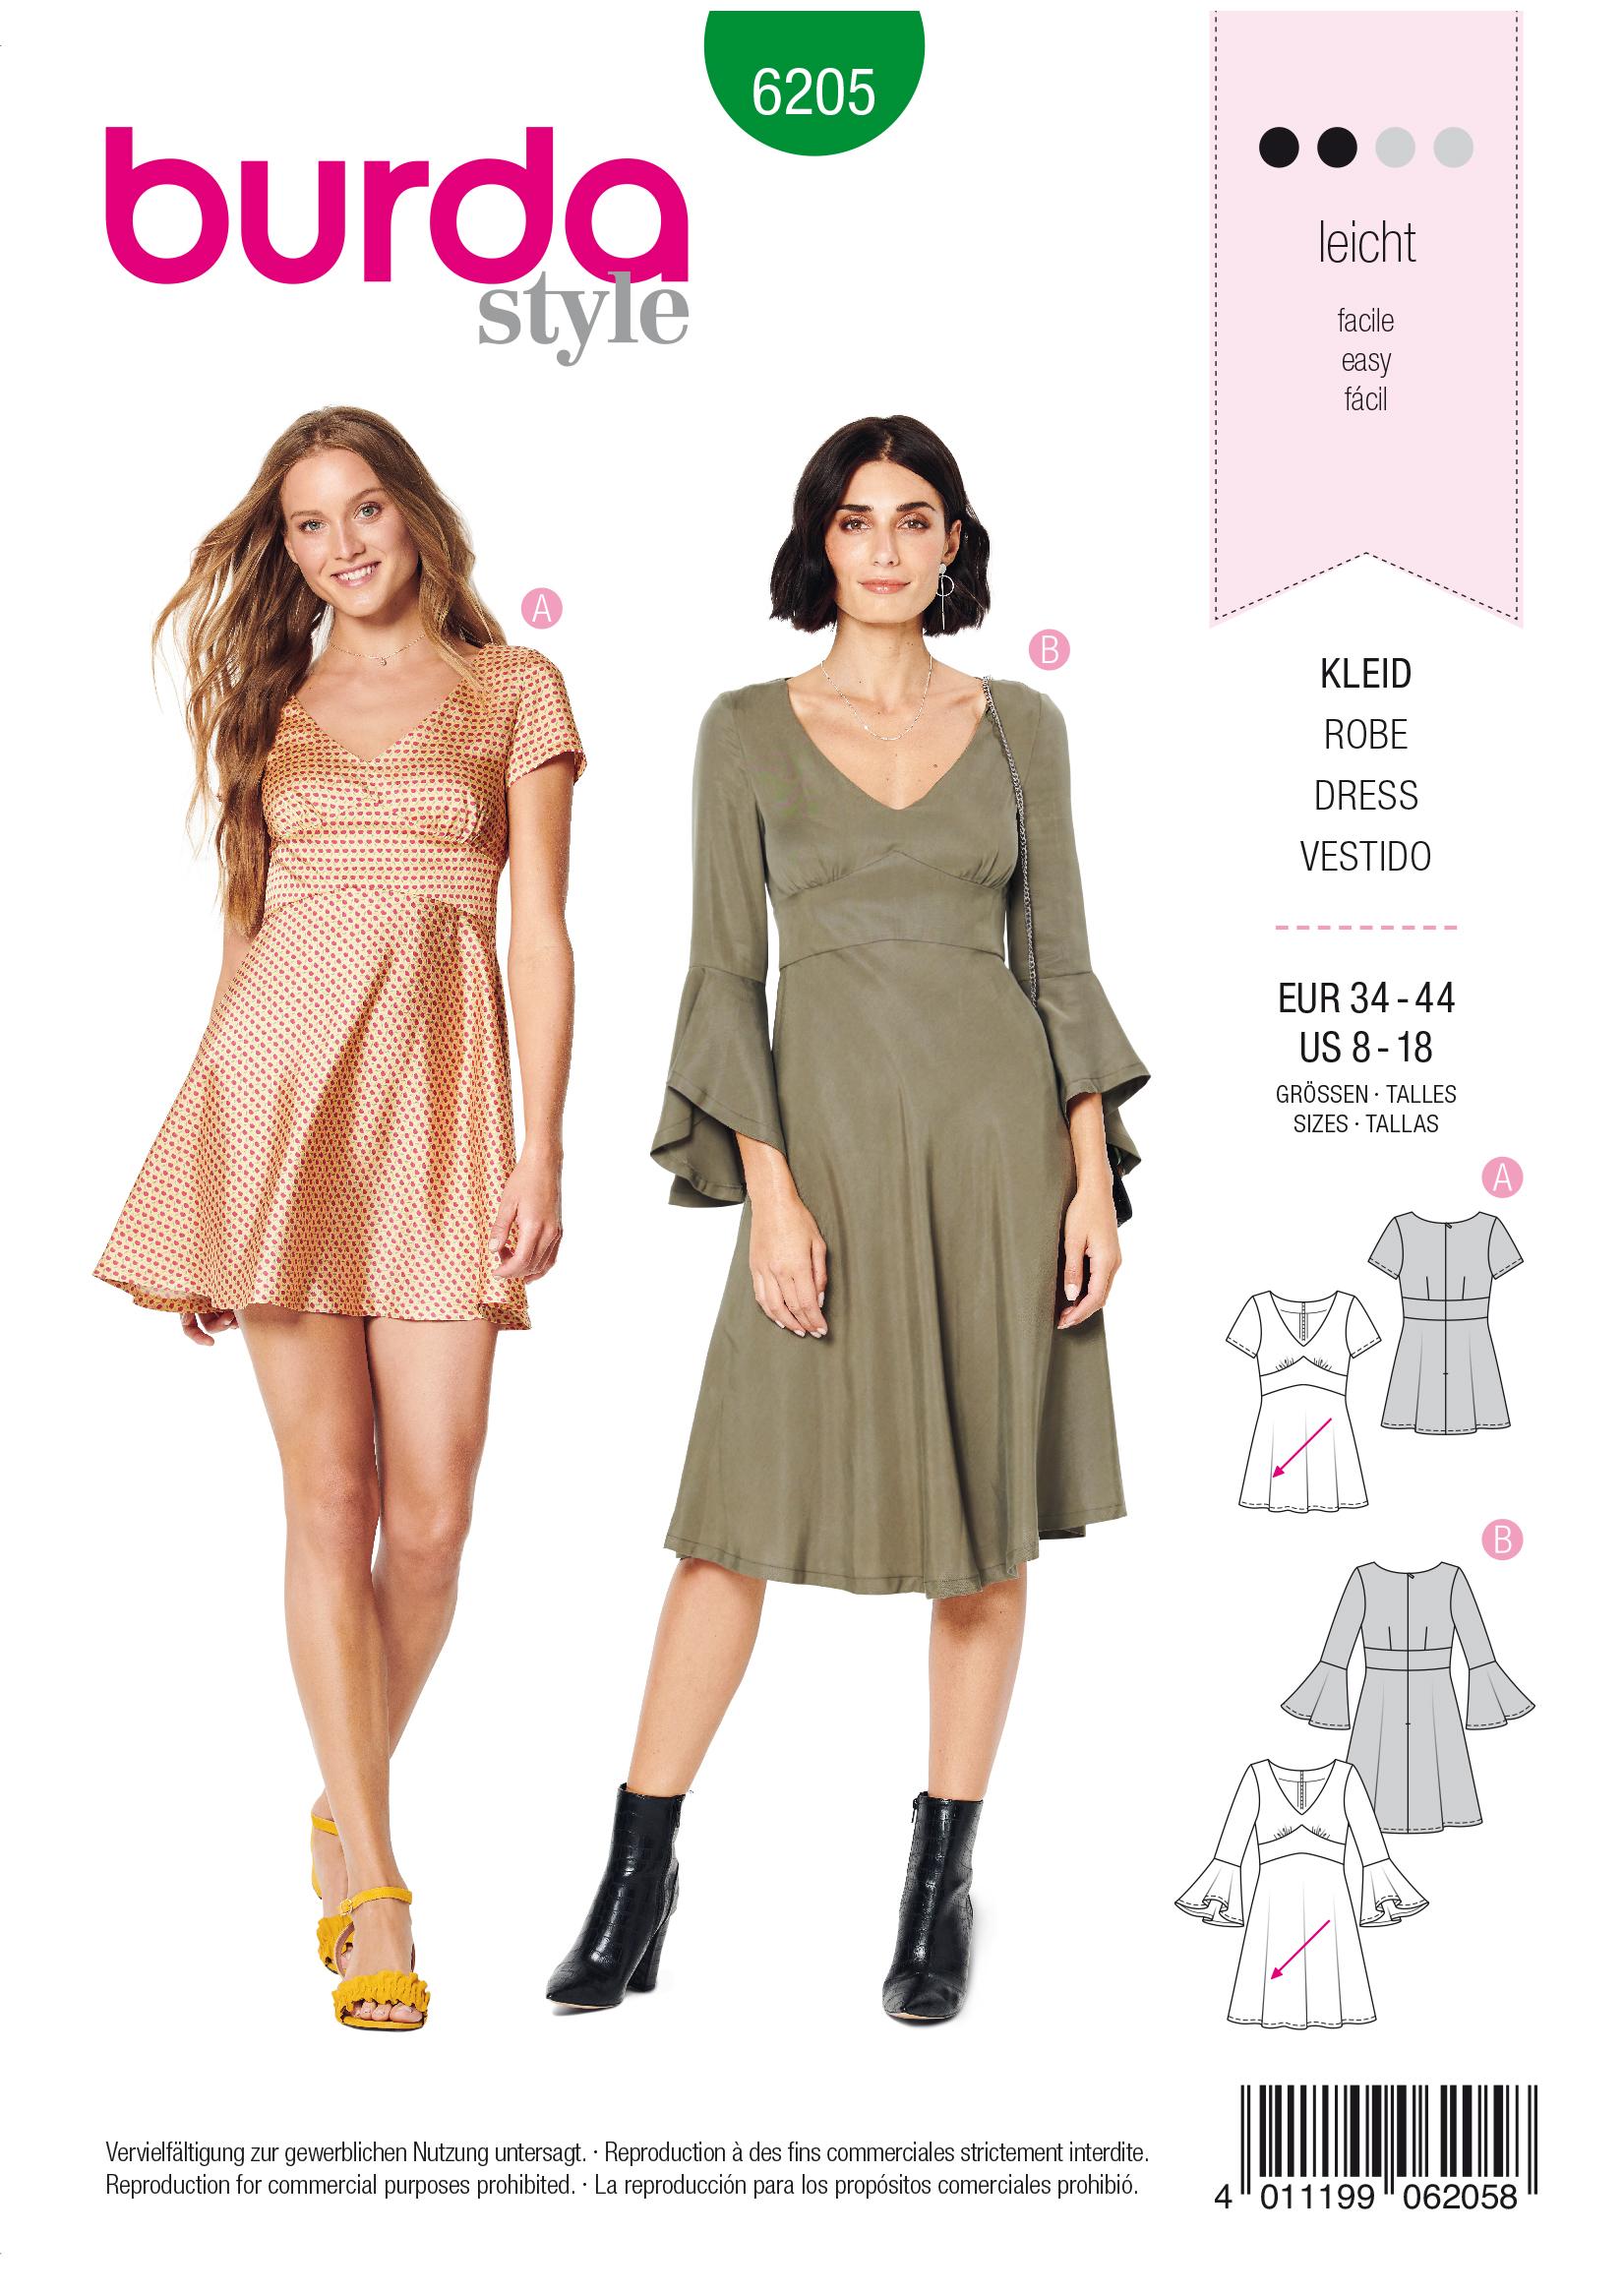 Kleid F/S 2020 #6205